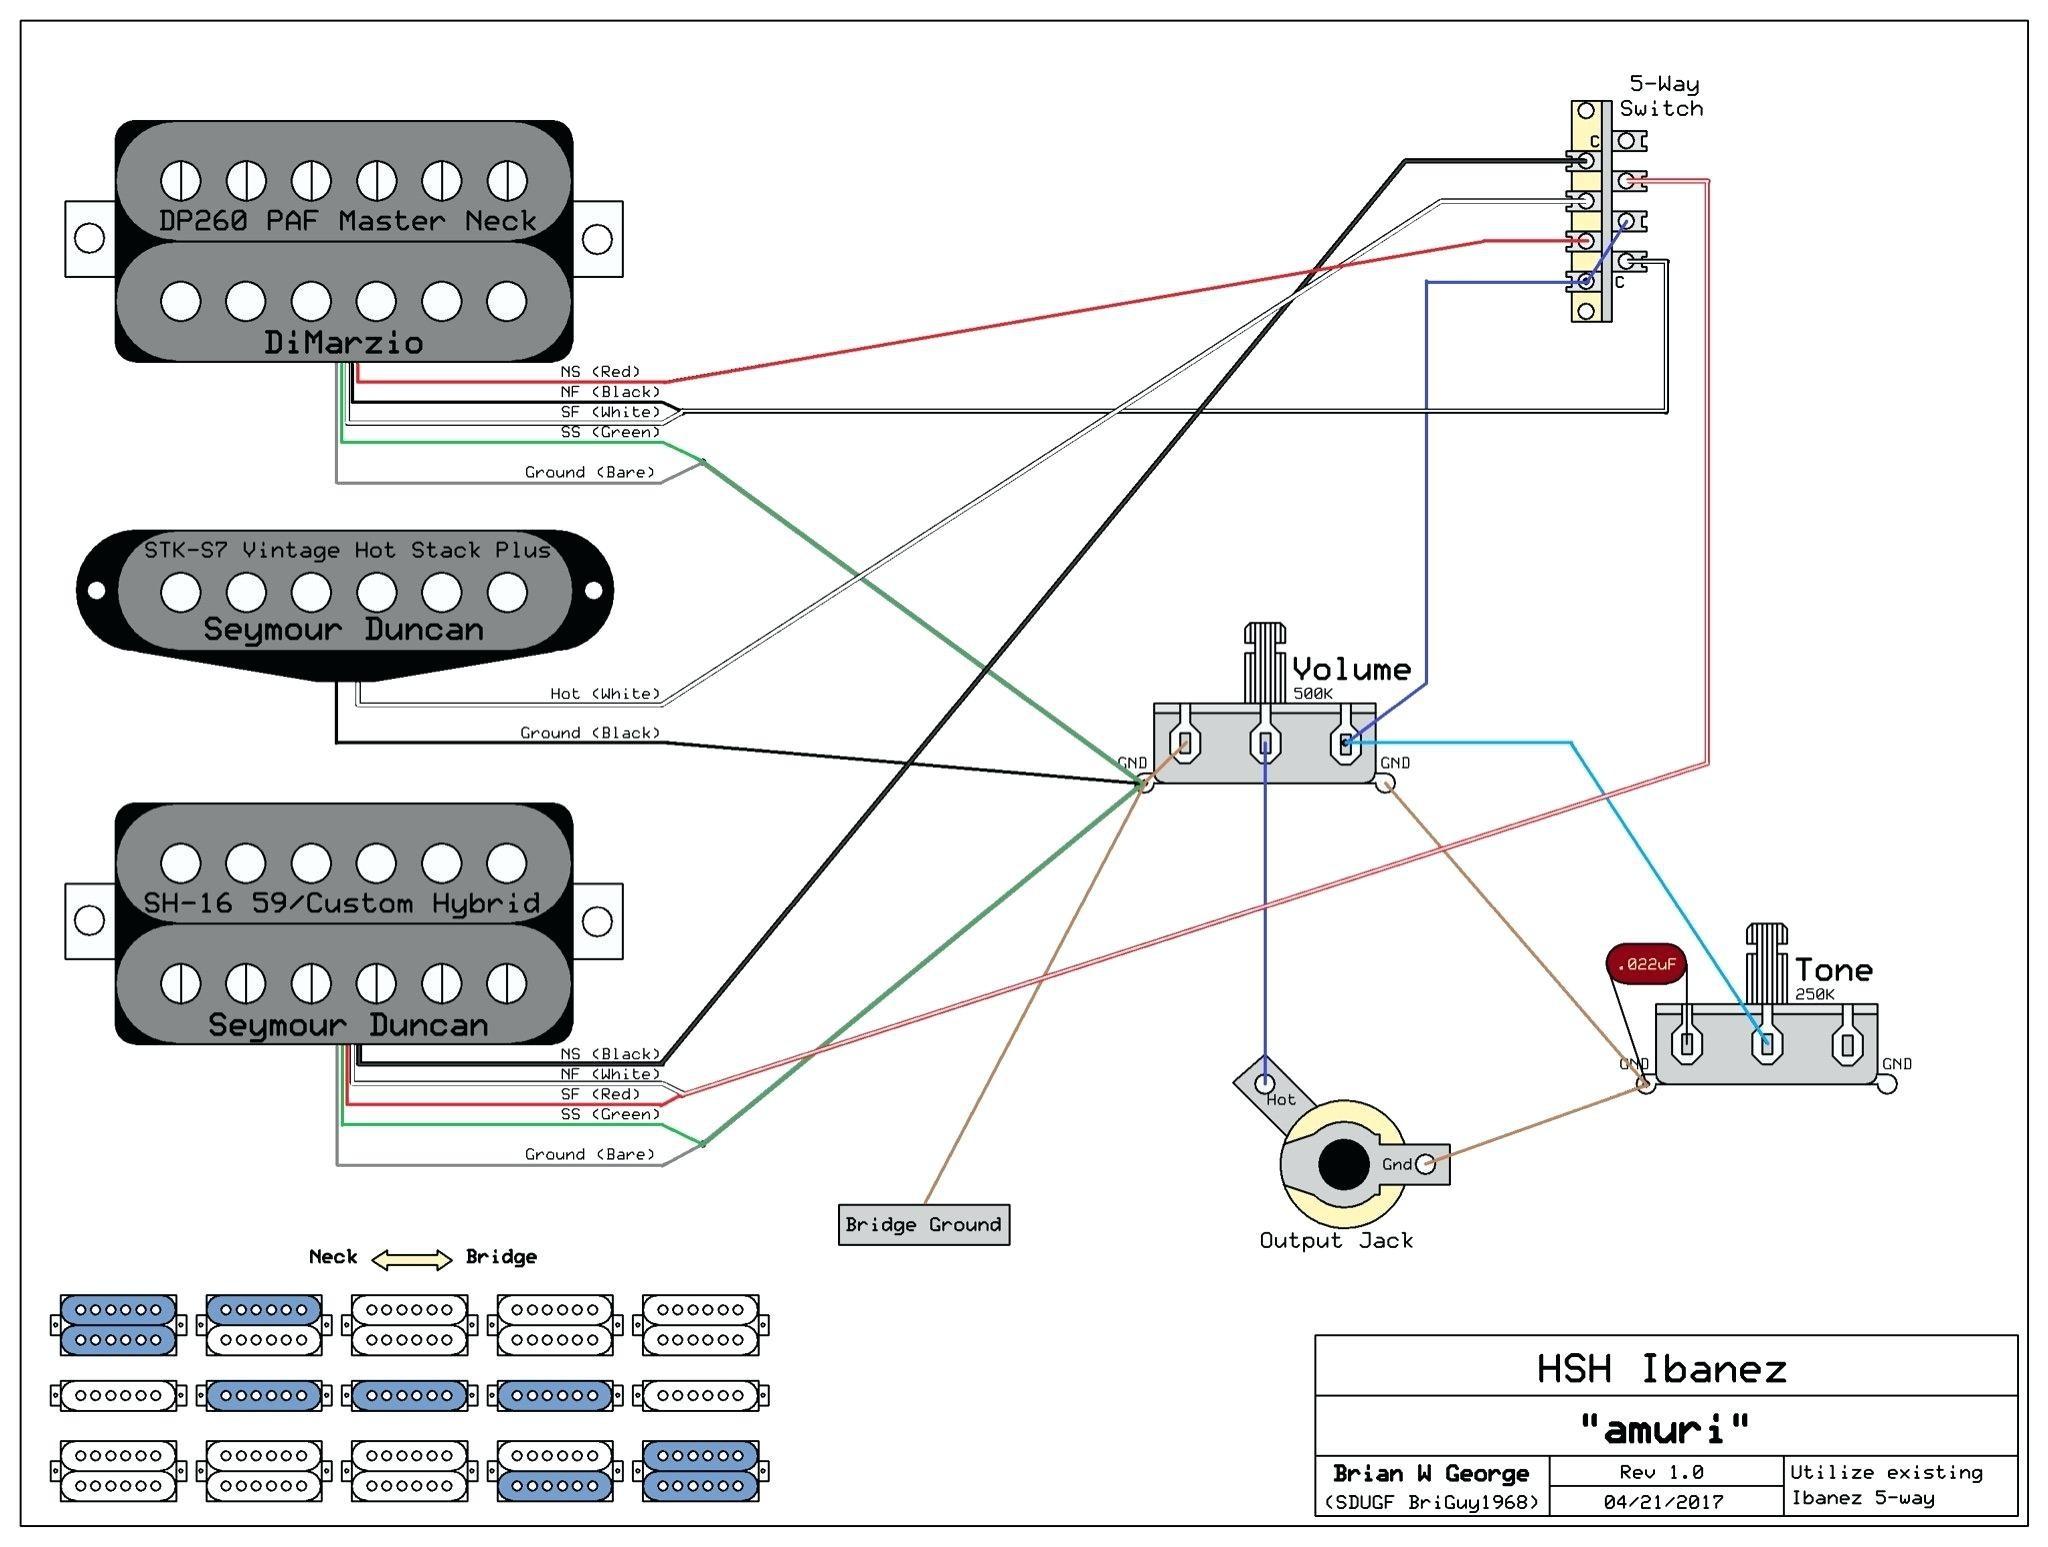 5 Way Switch Wiring Diagram Beautiful Fender Telecaster 4 Way Wiring Diagram Diagrams 5 Schemes Help